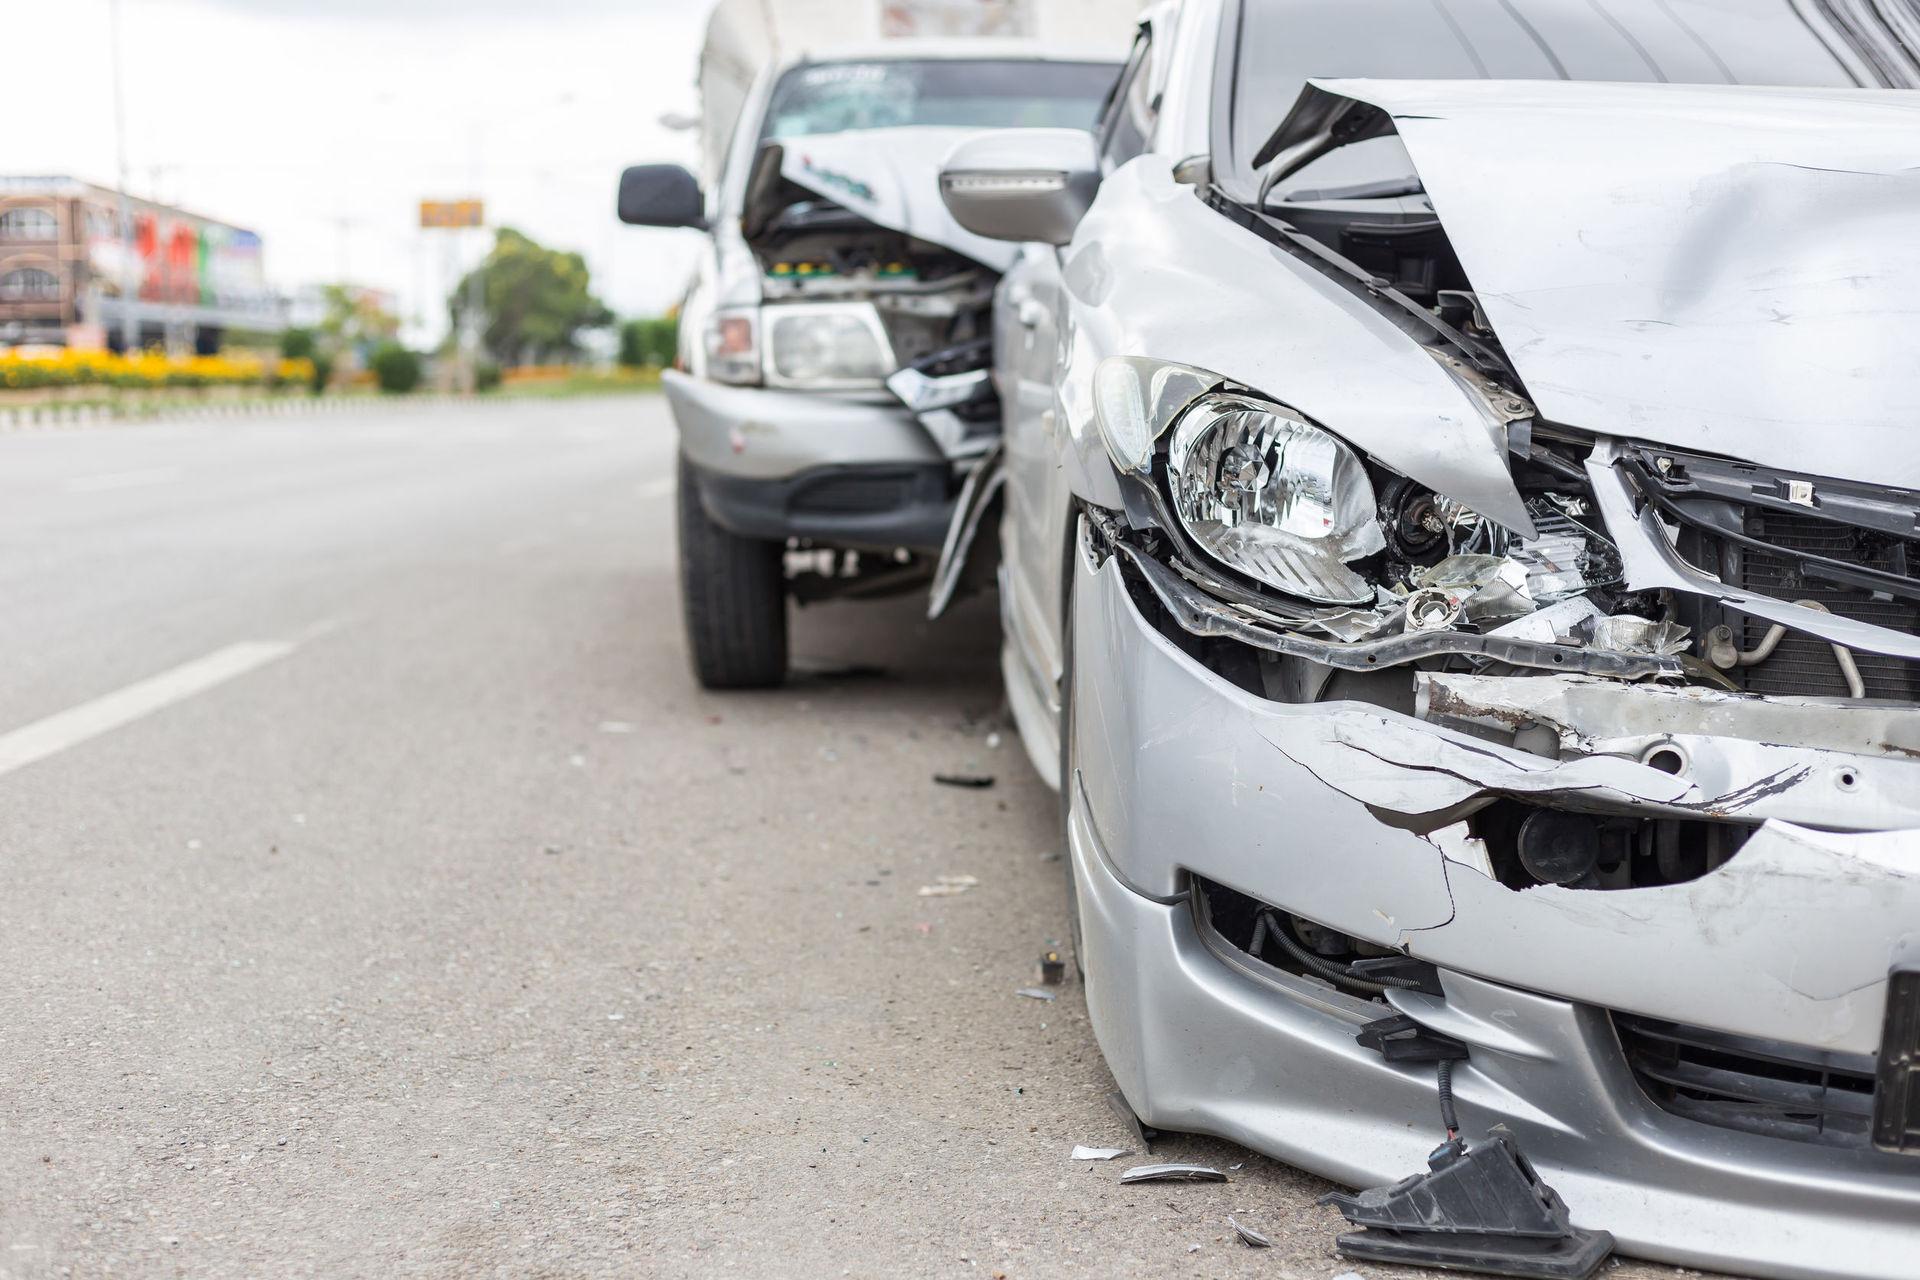 New Zealand's most dangerous vehicles